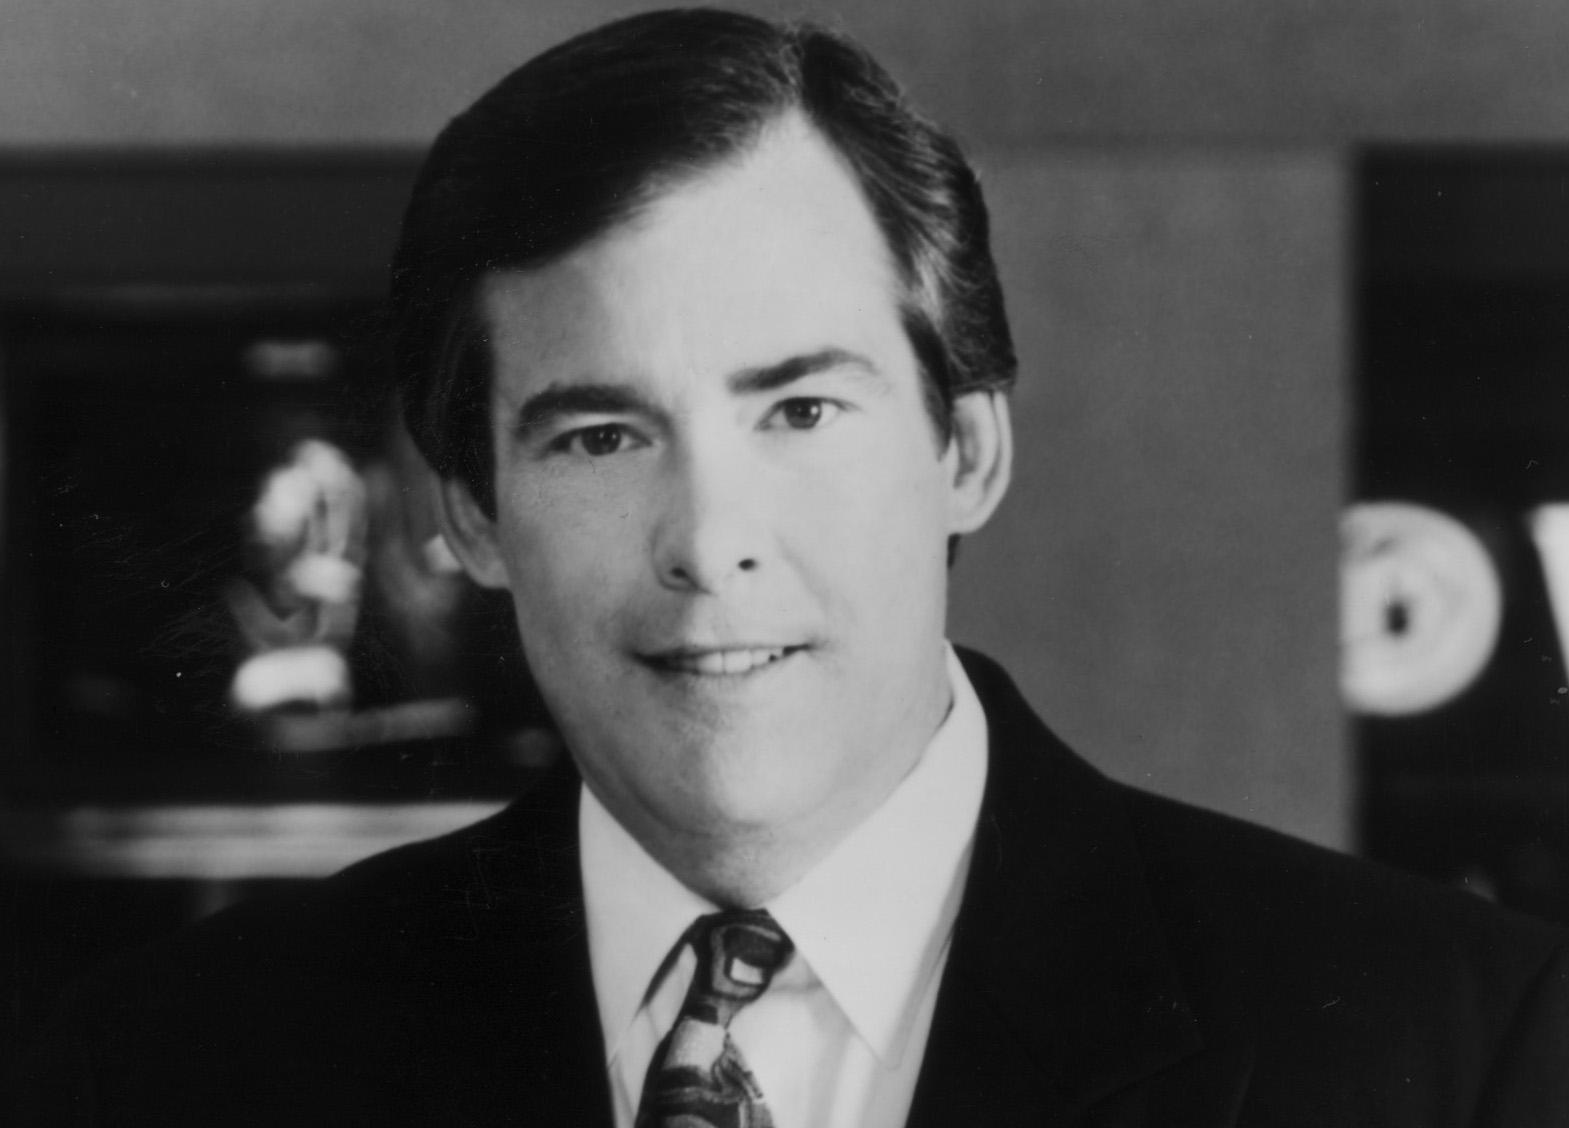 Veteran Houston anchorman Hemberger found dead - Houston